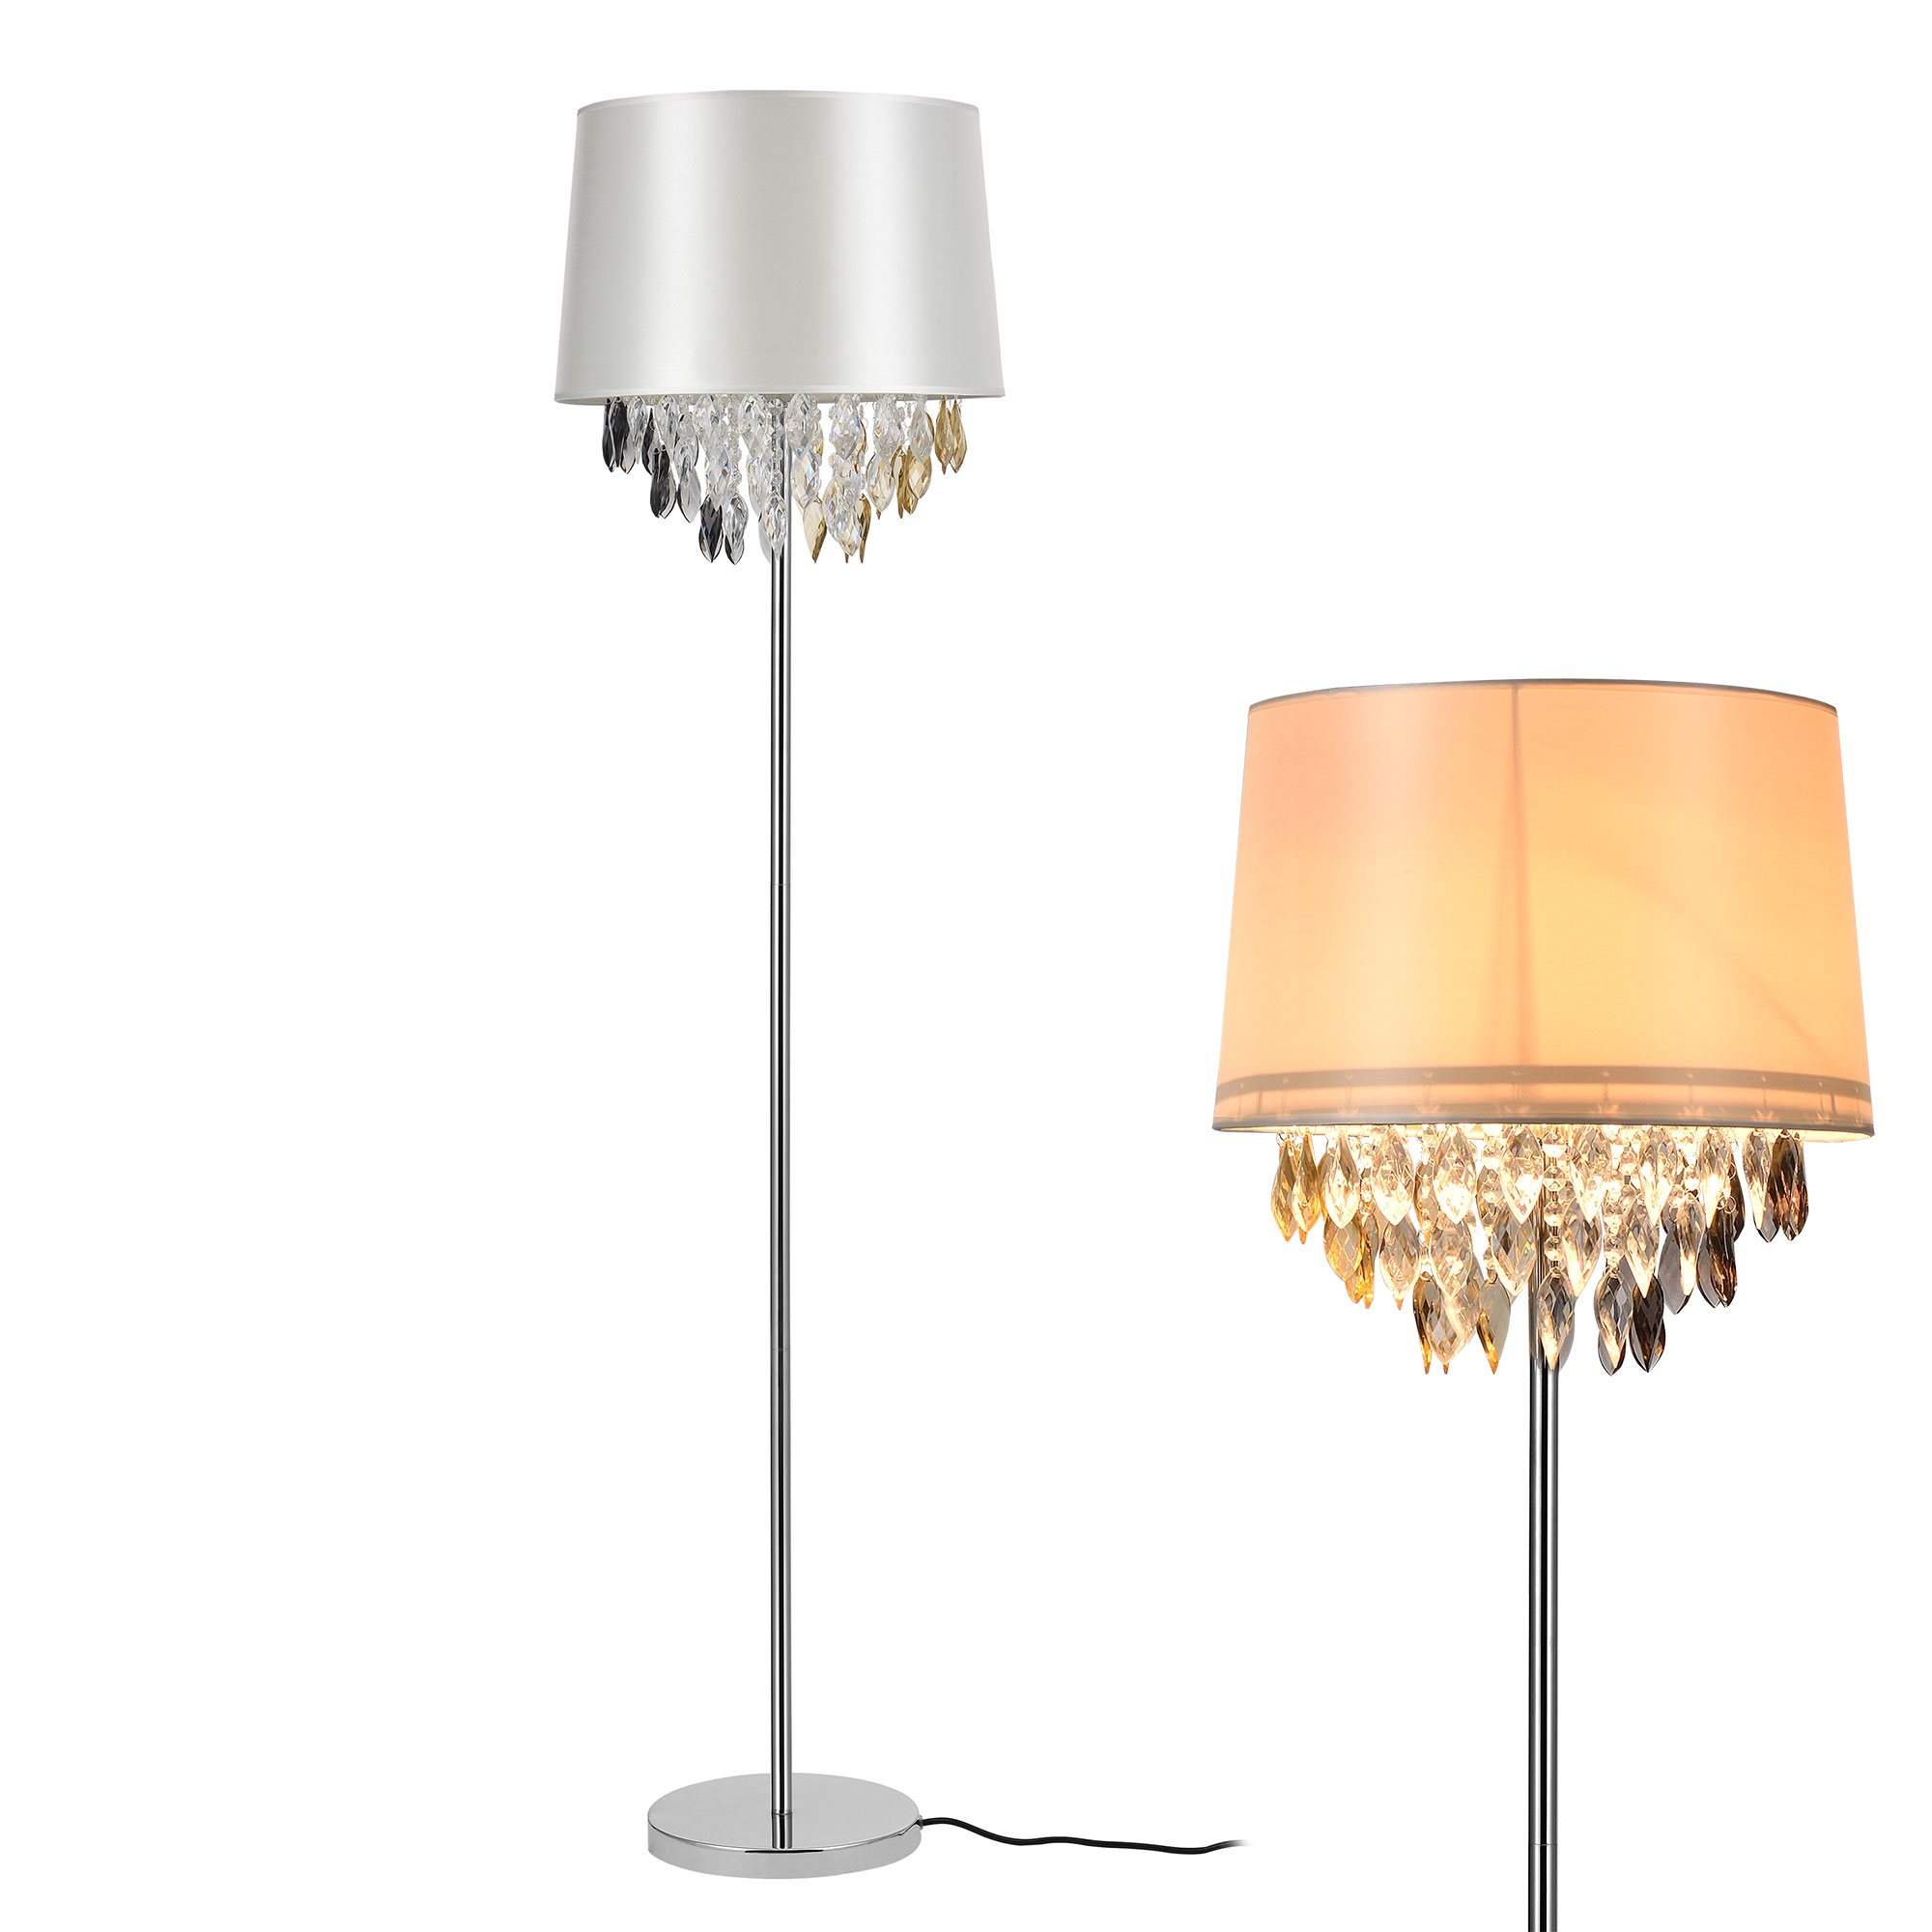 stehleuchte stehlampe design lampe leuchte standleuchte chrom boden ebay. Black Bedroom Furniture Sets. Home Design Ideas